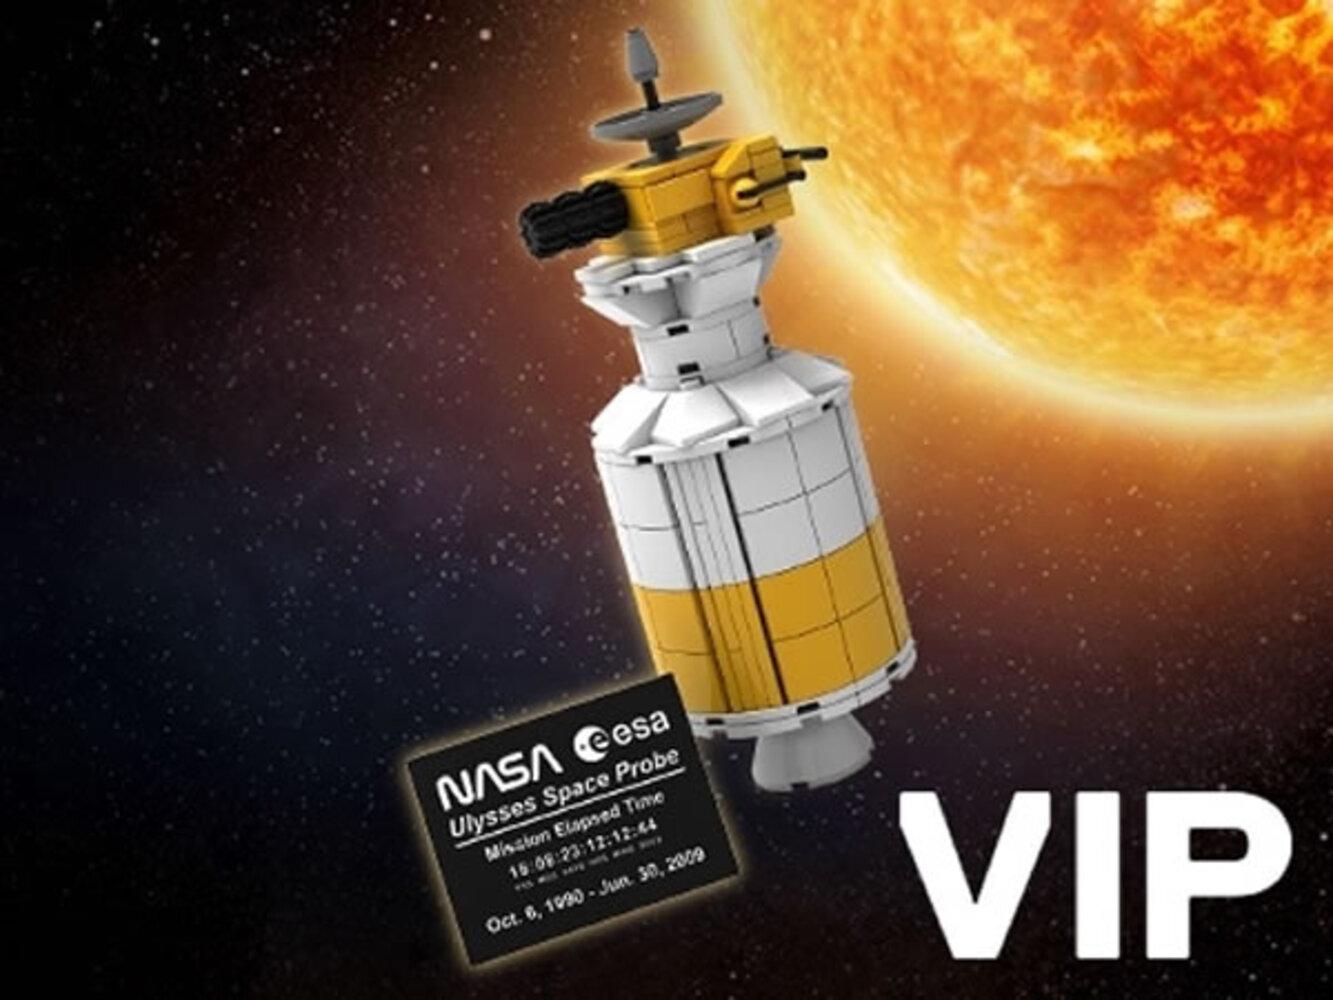 Ulysses Space Probe VIP Reward